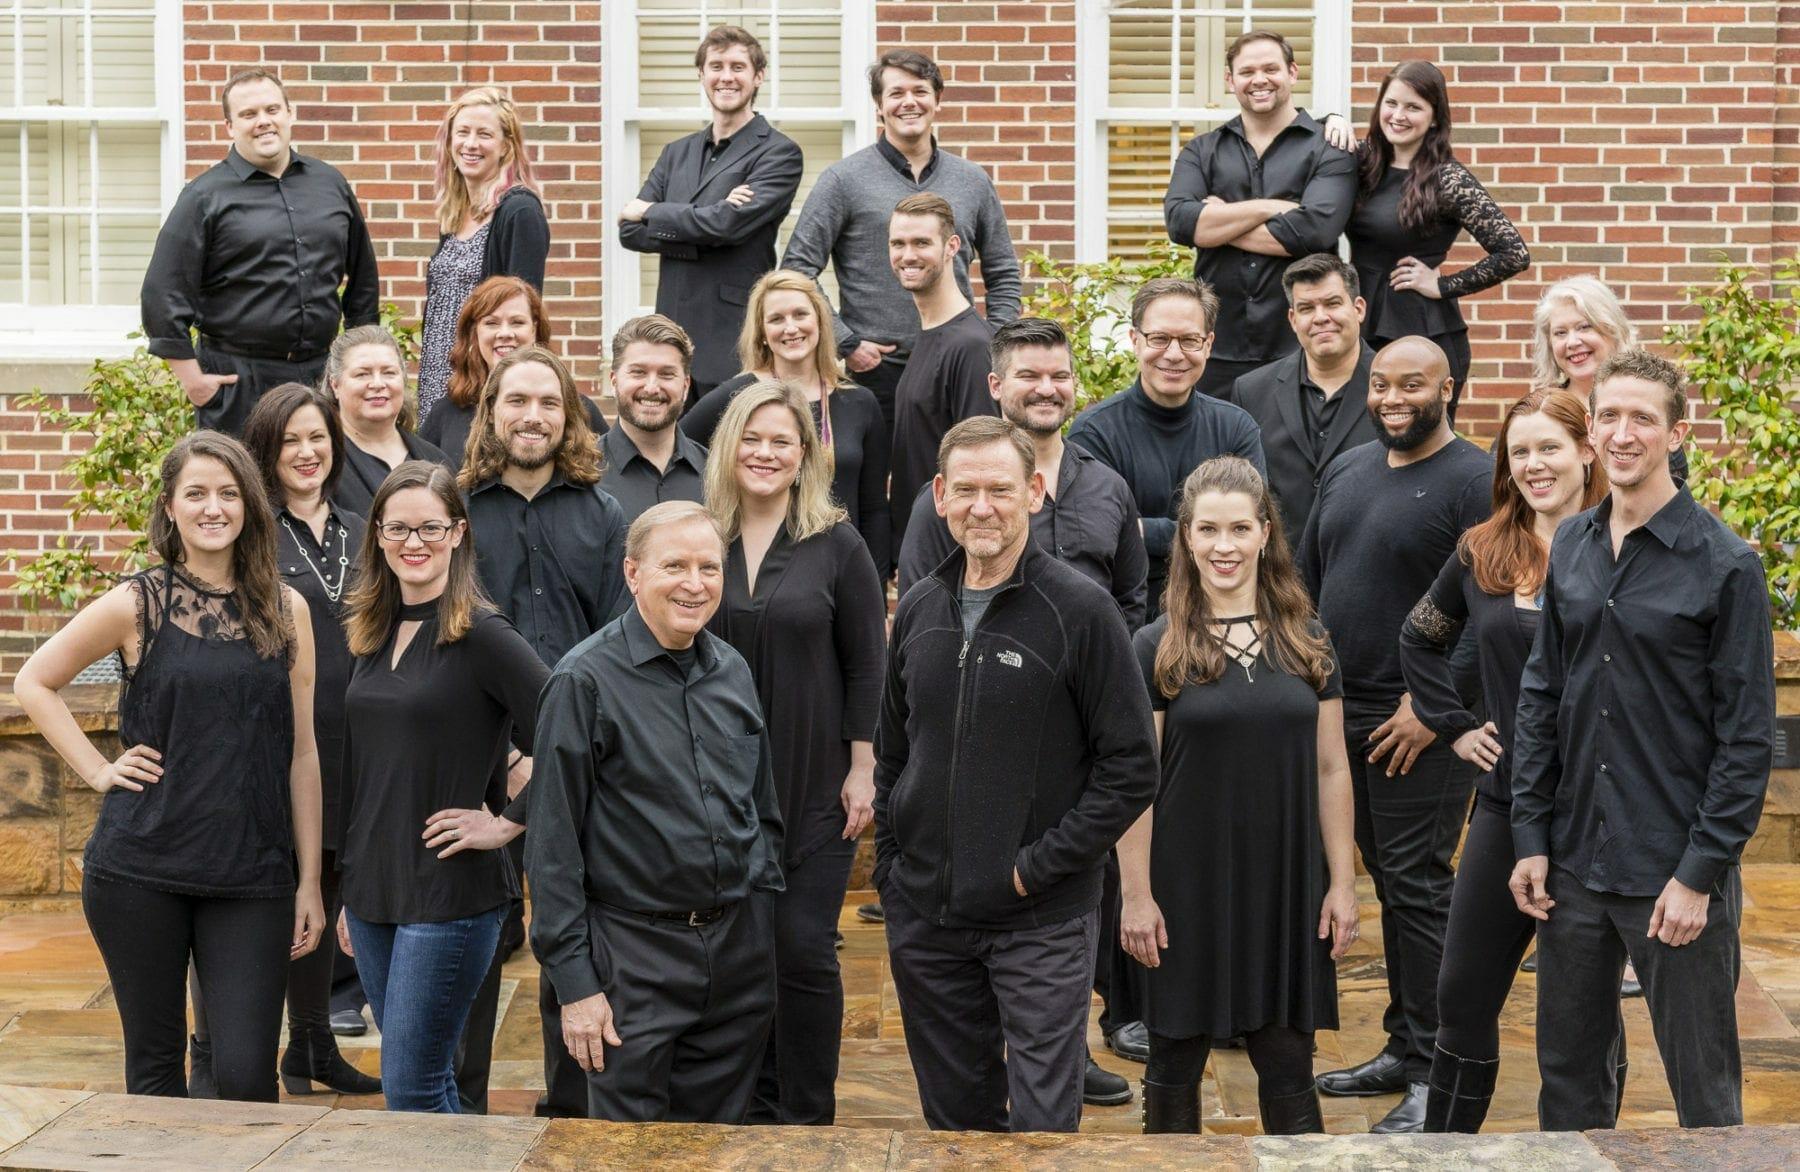 The Coro Vacati choral group